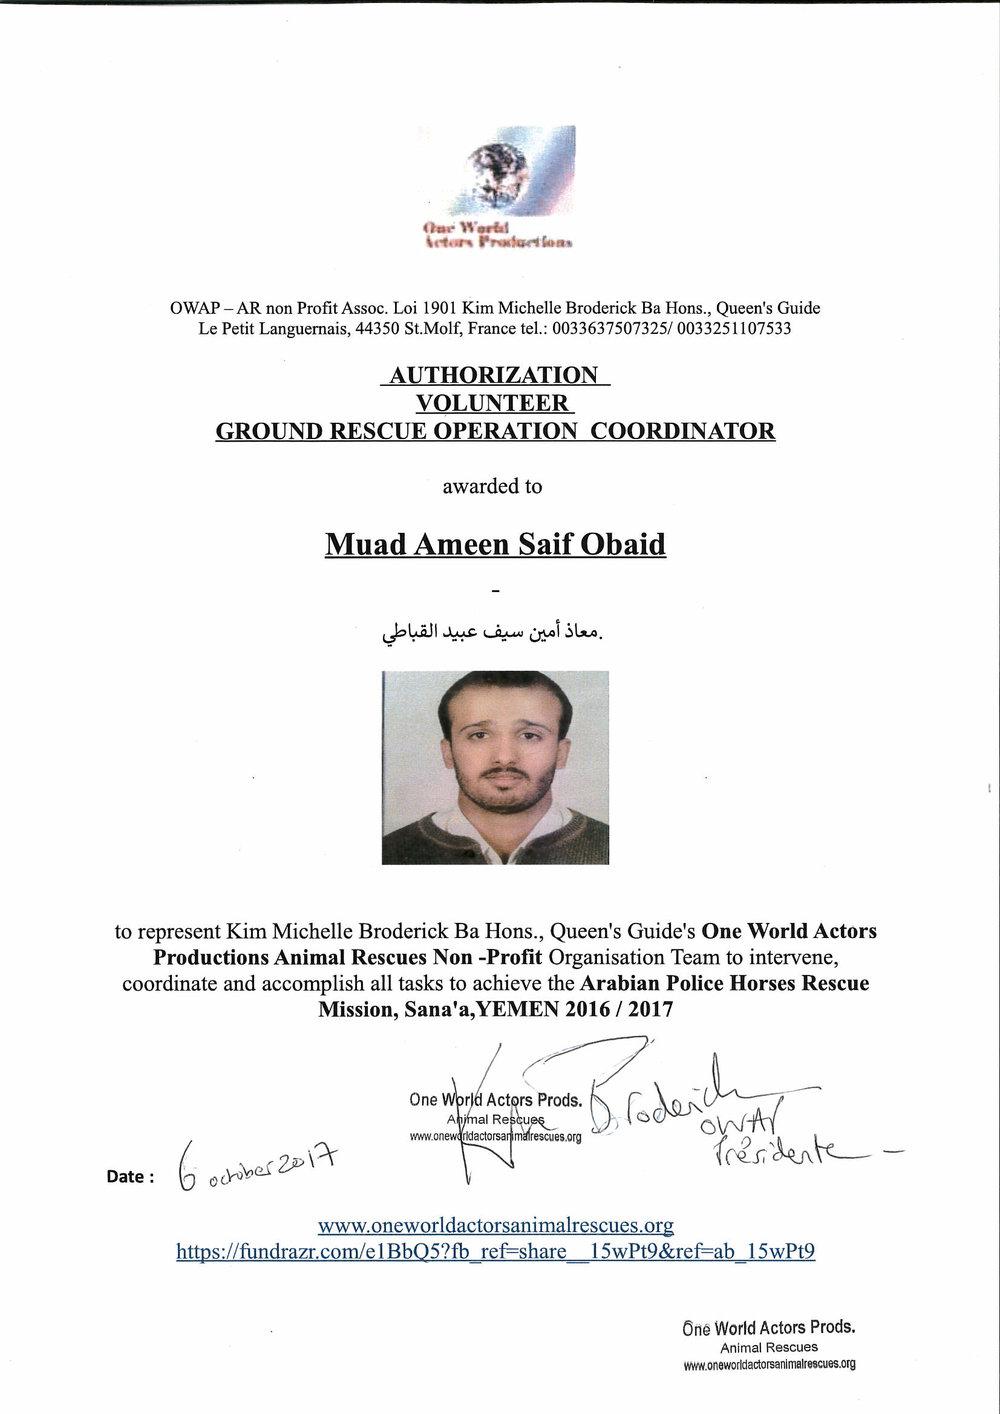 Volunteer Muad Ameen Saif Obaid OWAP-AR Arabian Police Horses Rescue Mission Sana'a Yemen.jpg